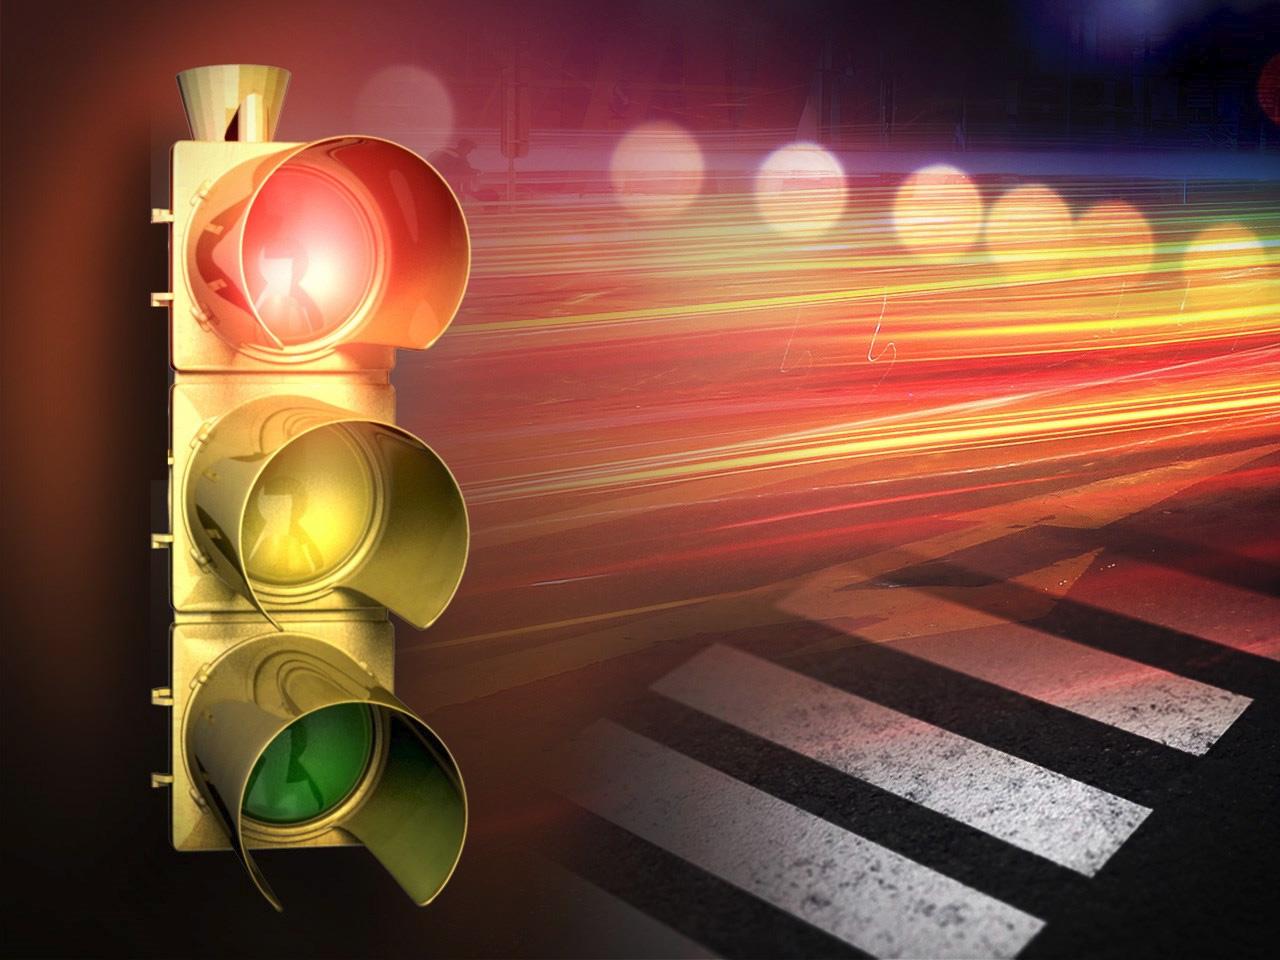 traffic crosswalk_1546046673229.jpg.jpg